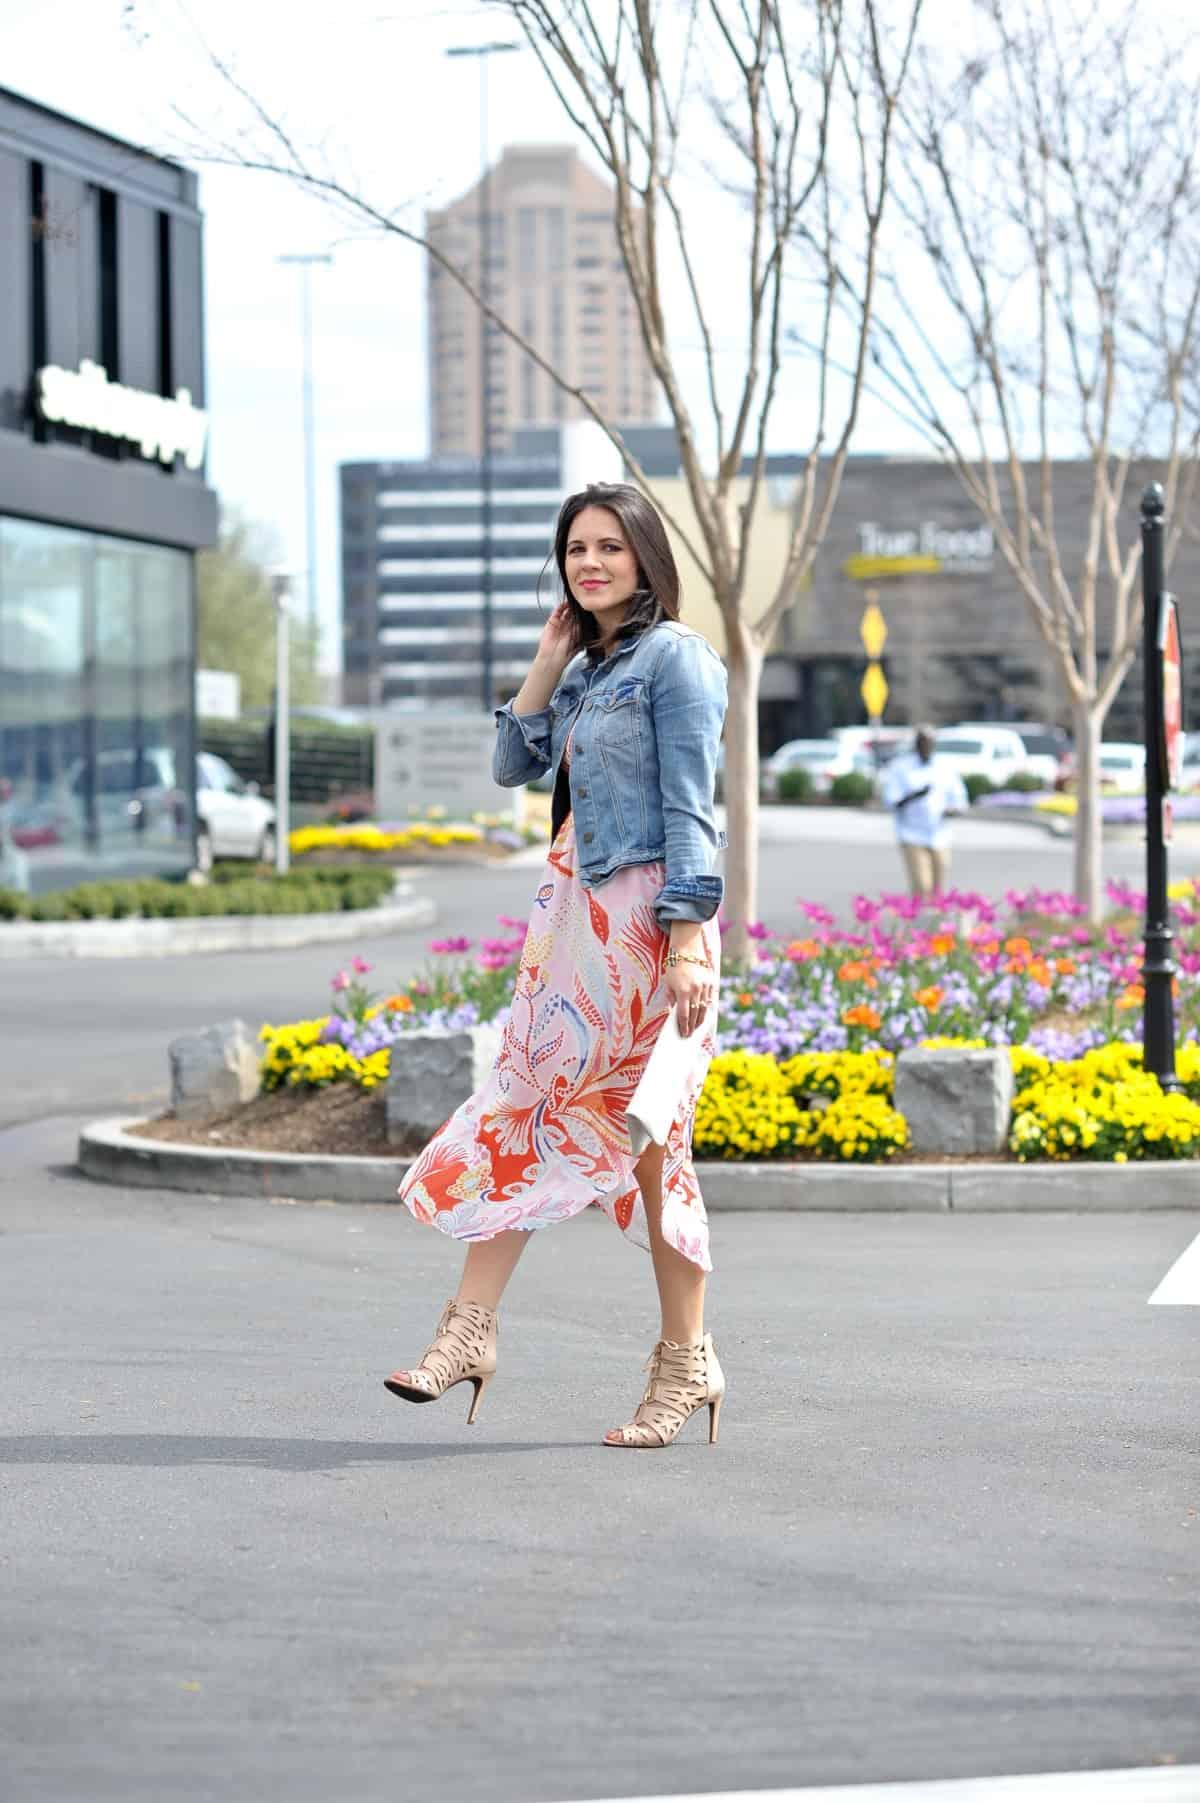 Banjanan Cochella Dress - printed floral dress for summer - My Style Vita - @mystylevita - 7